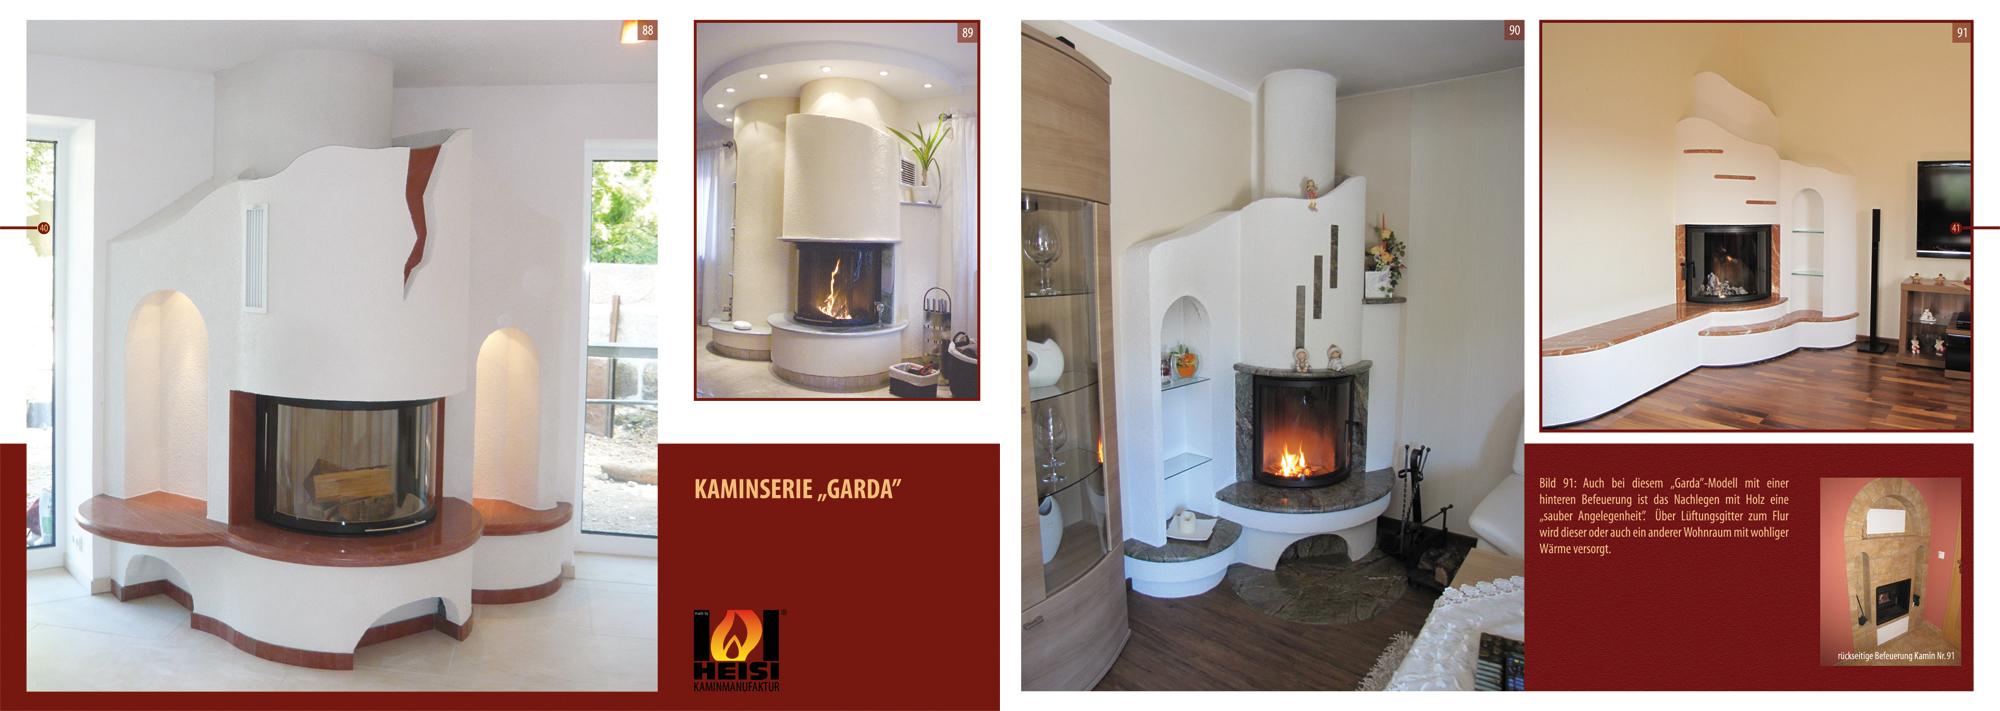 katalog heisi kaminschmiede gmbh. Black Bedroom Furniture Sets. Home Design Ideas